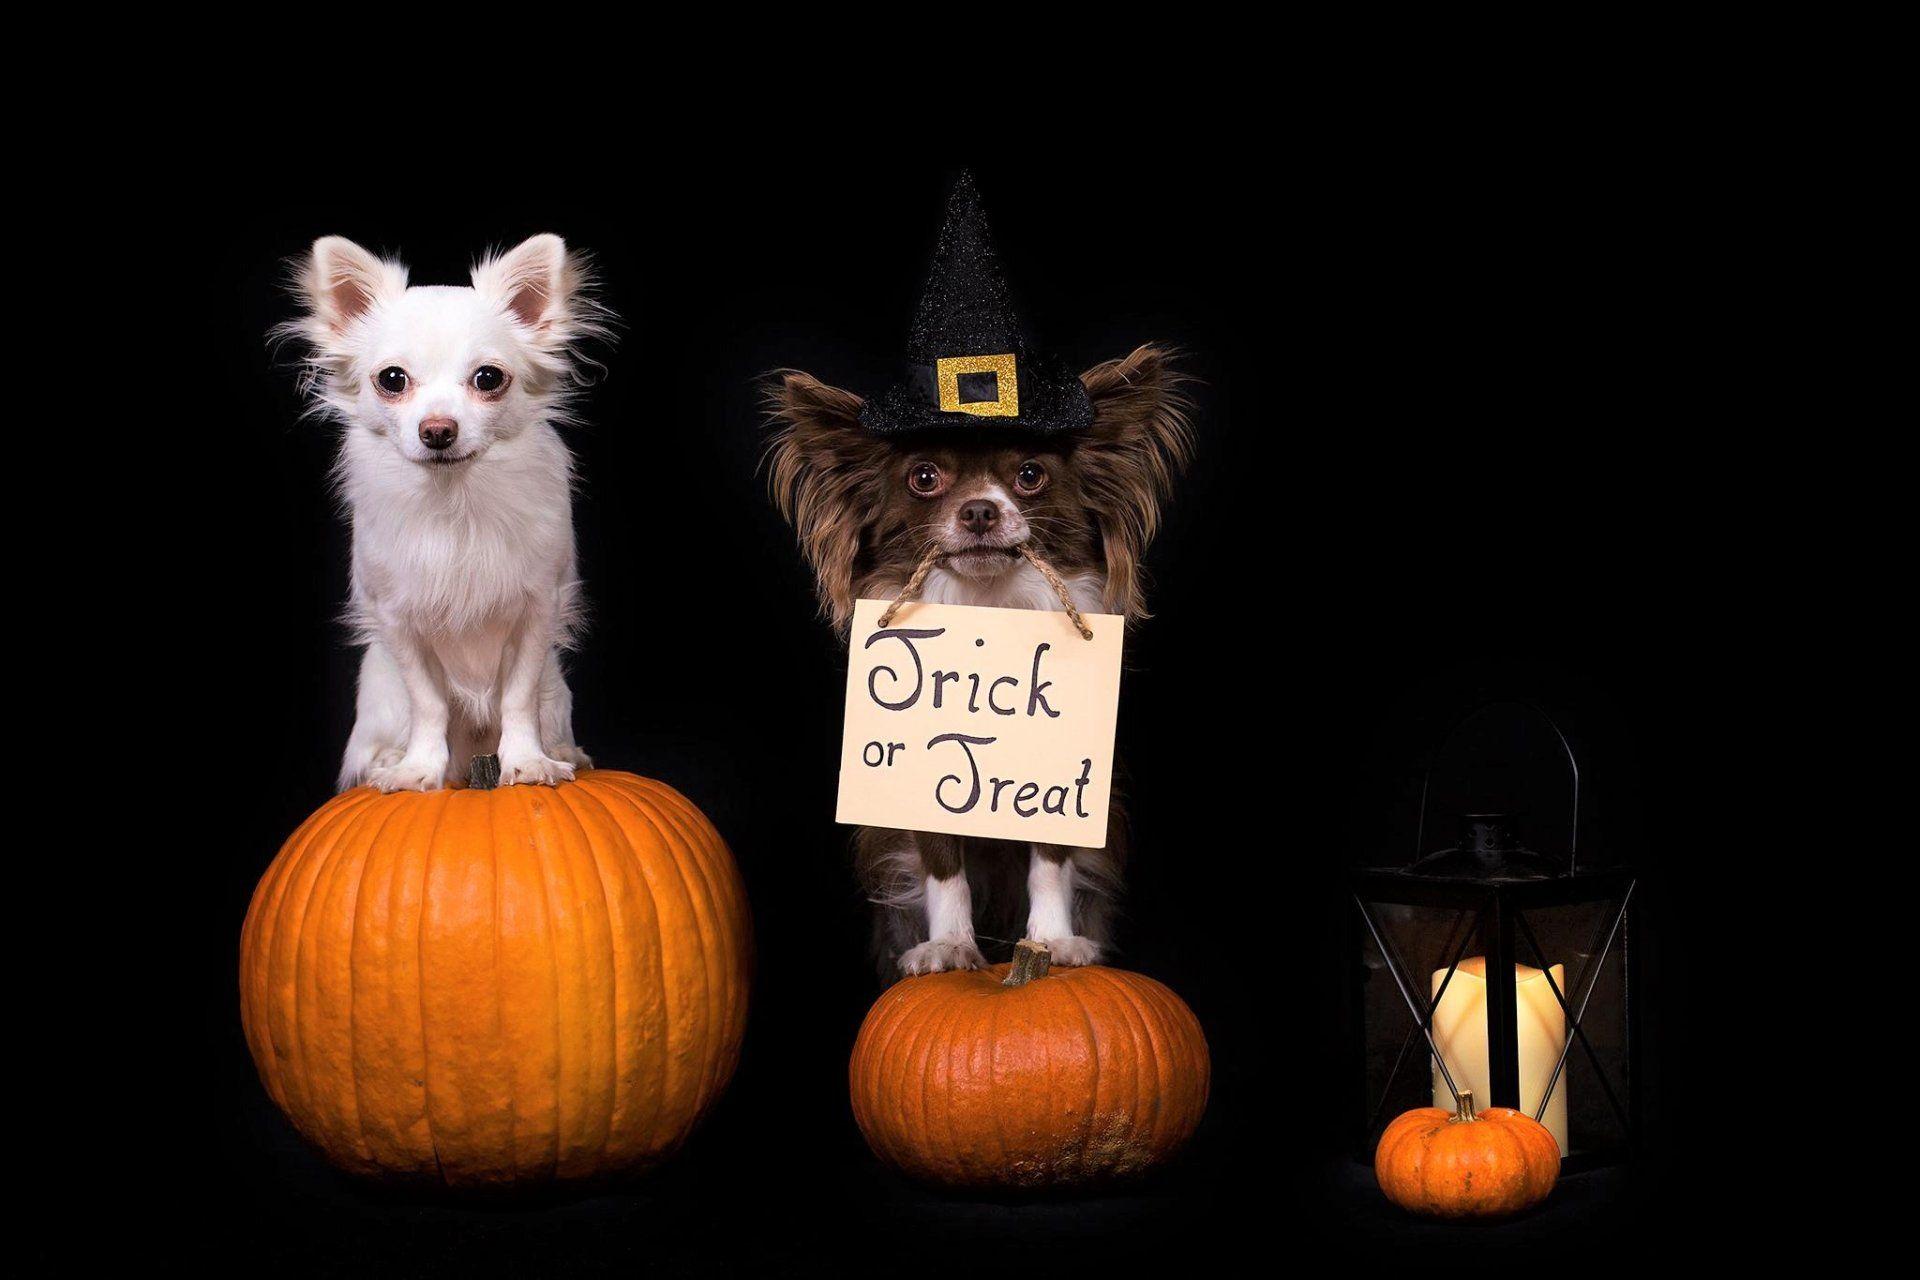 Holiday Halloween Holiday Dog Pumpkin Trick Or Treat Wallpaper Dog Halloween Dog Holiday Halloween Wallpaper